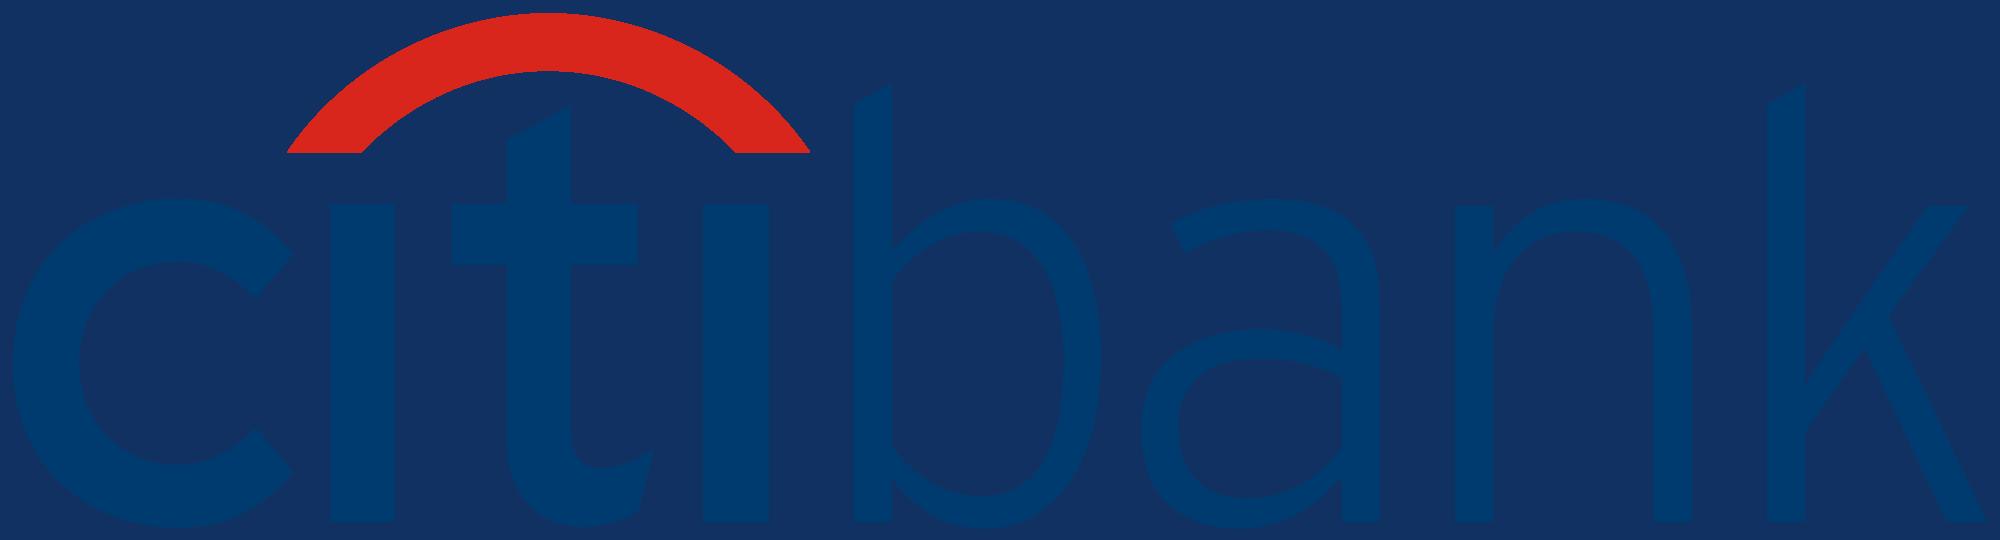 Citibank Business Loans Review 2019 Ratings Complaints